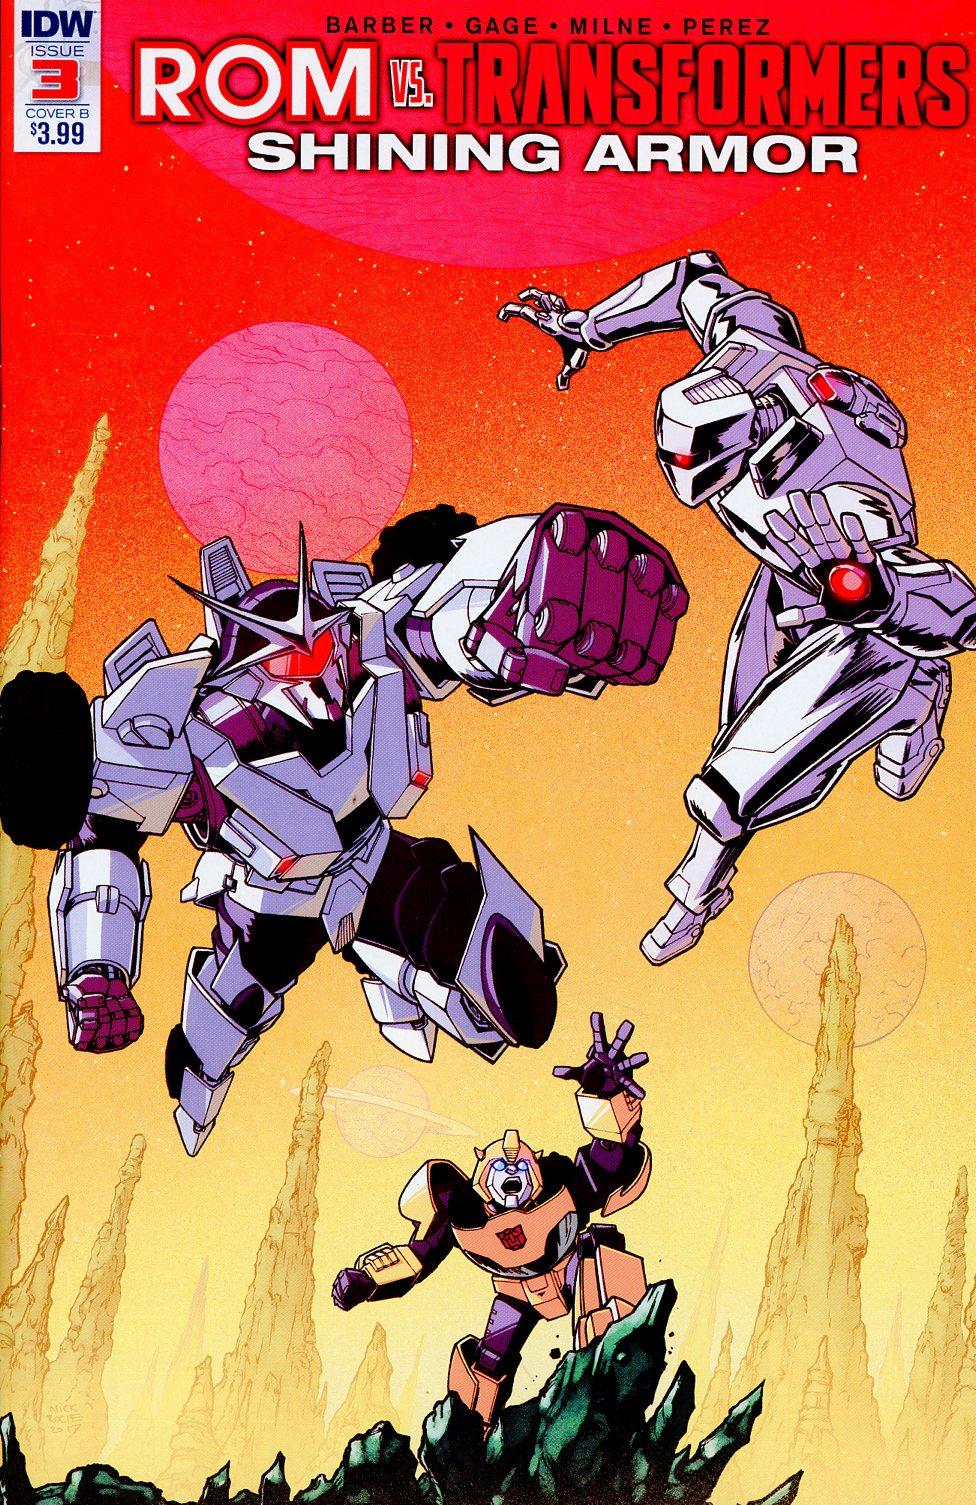 ROM vs Transformers Shining Armor #3 Cover B Variant Nick Roche Cover